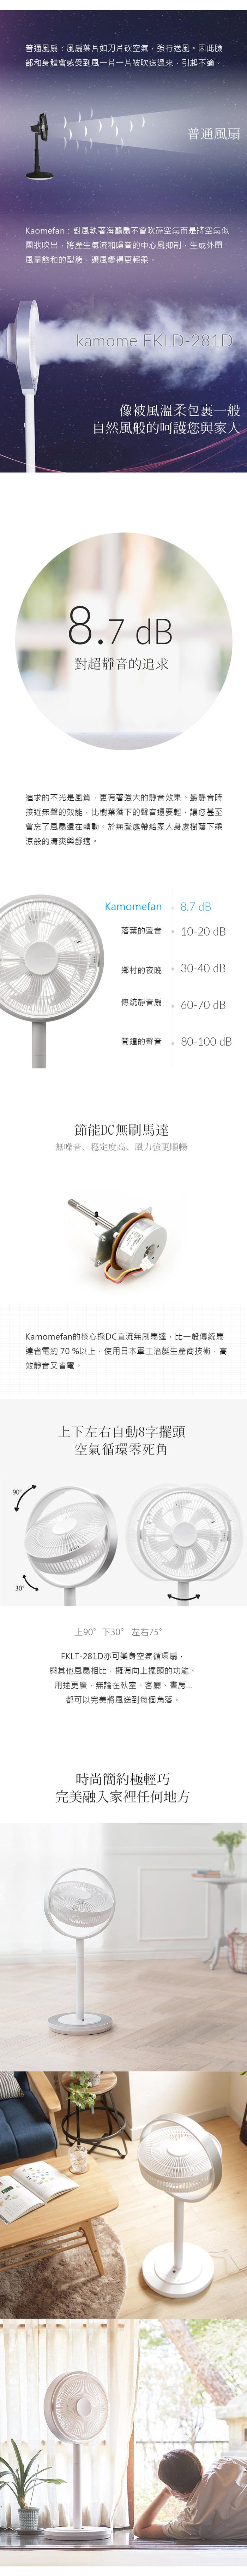 KAMOME|FKLT-281D 極靜音直立式電風扇(二入組)